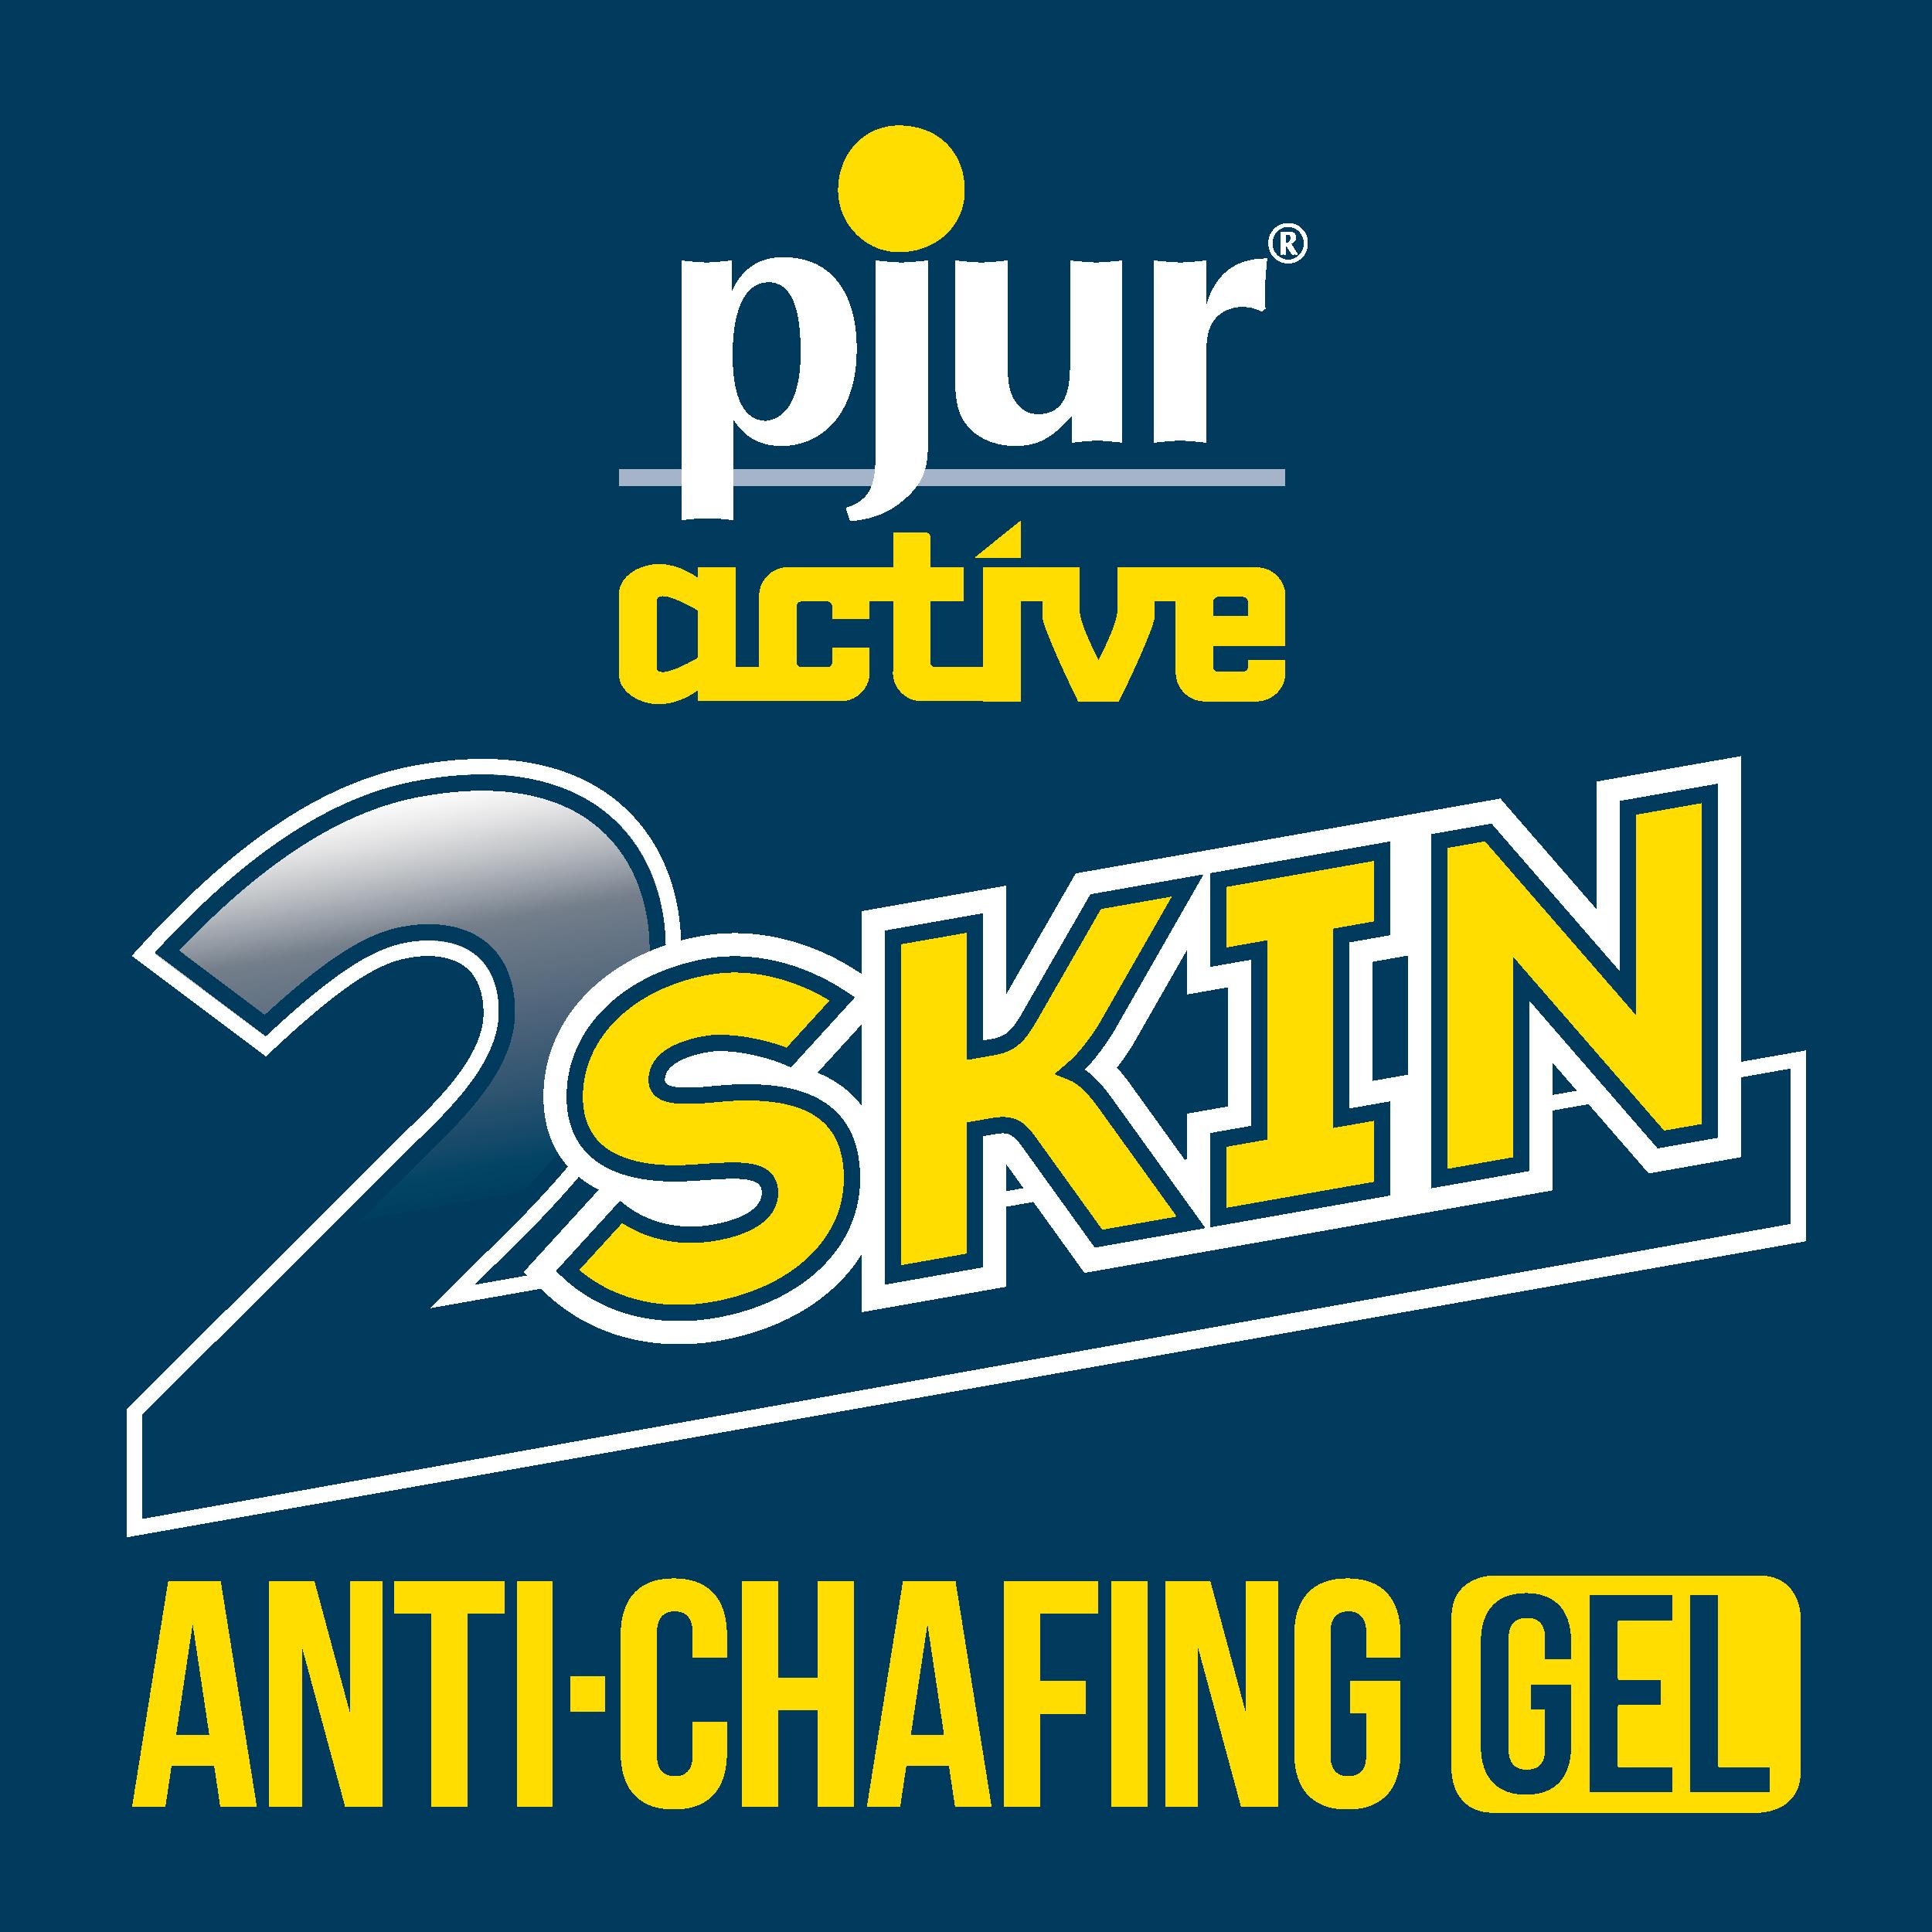 Pjuractive 2skin (Foto: Pjuractive)